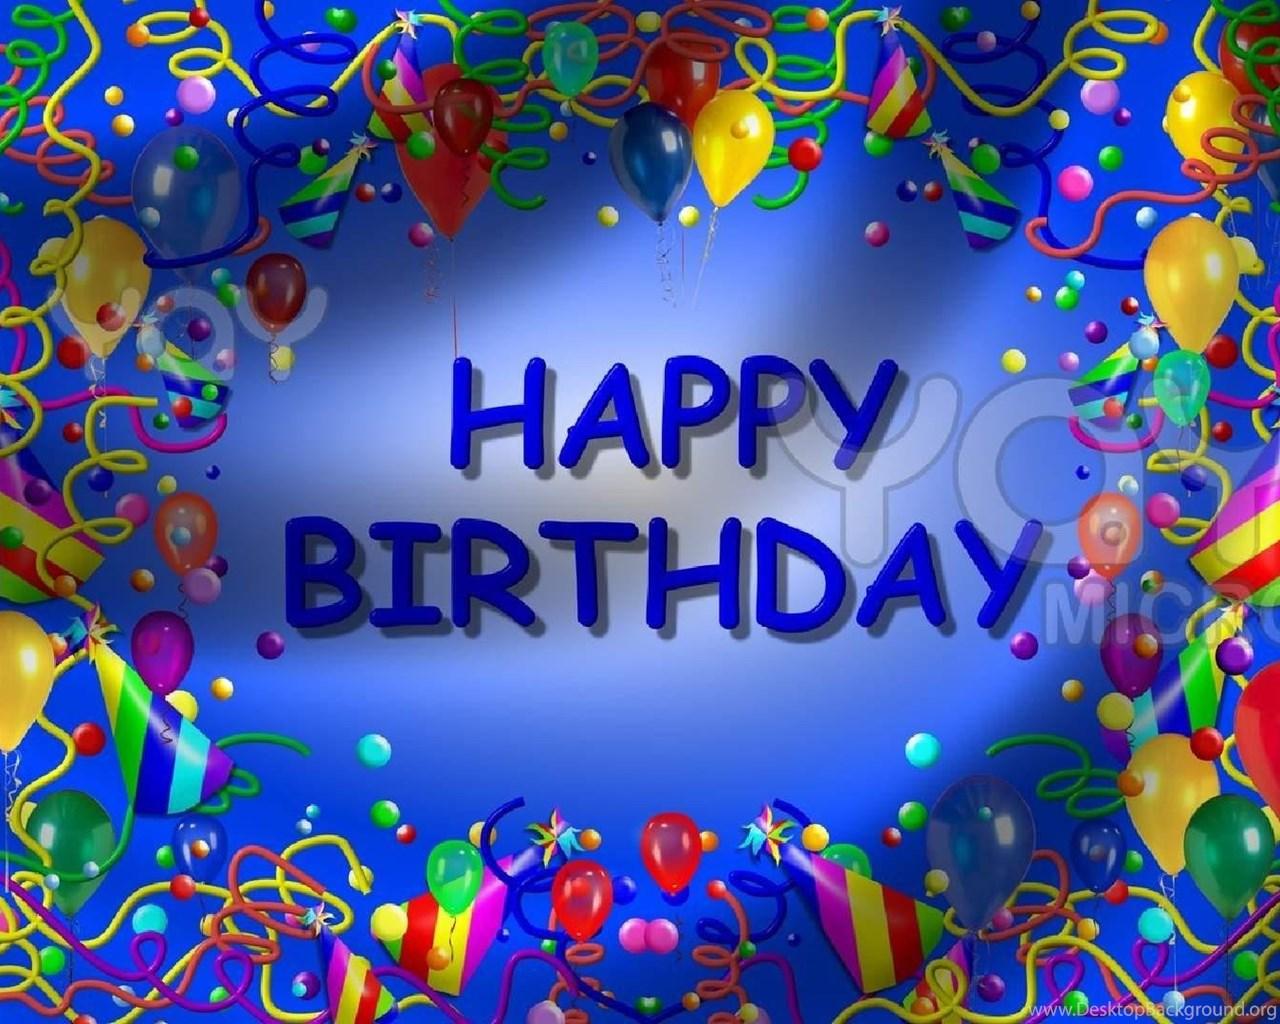 Happy Birthday Wallpapers In Full HD HappyBirthday99